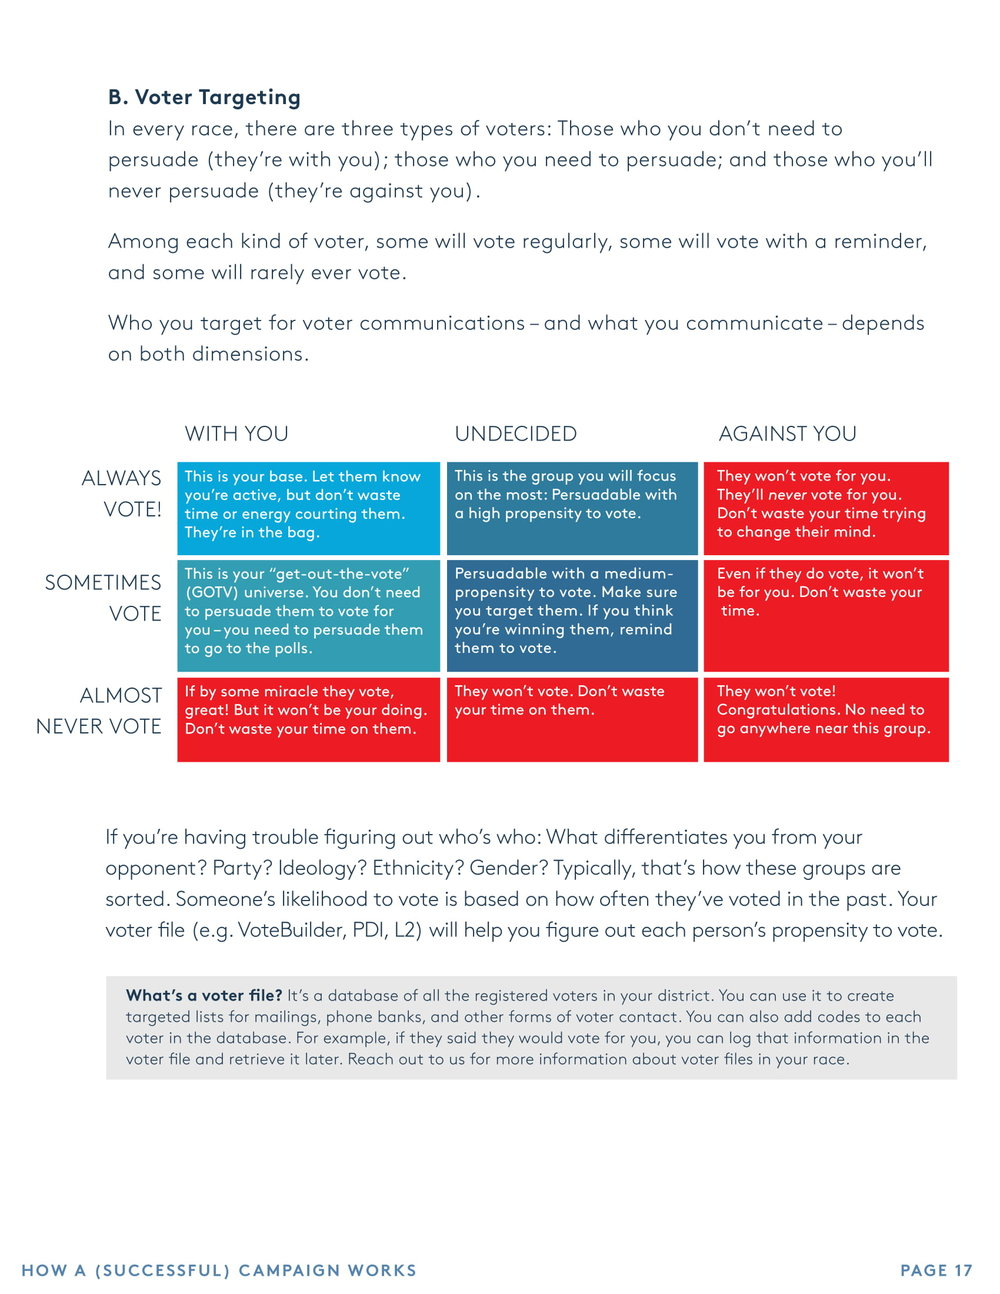 HSG_CampaignGuide_v5-17.jpg